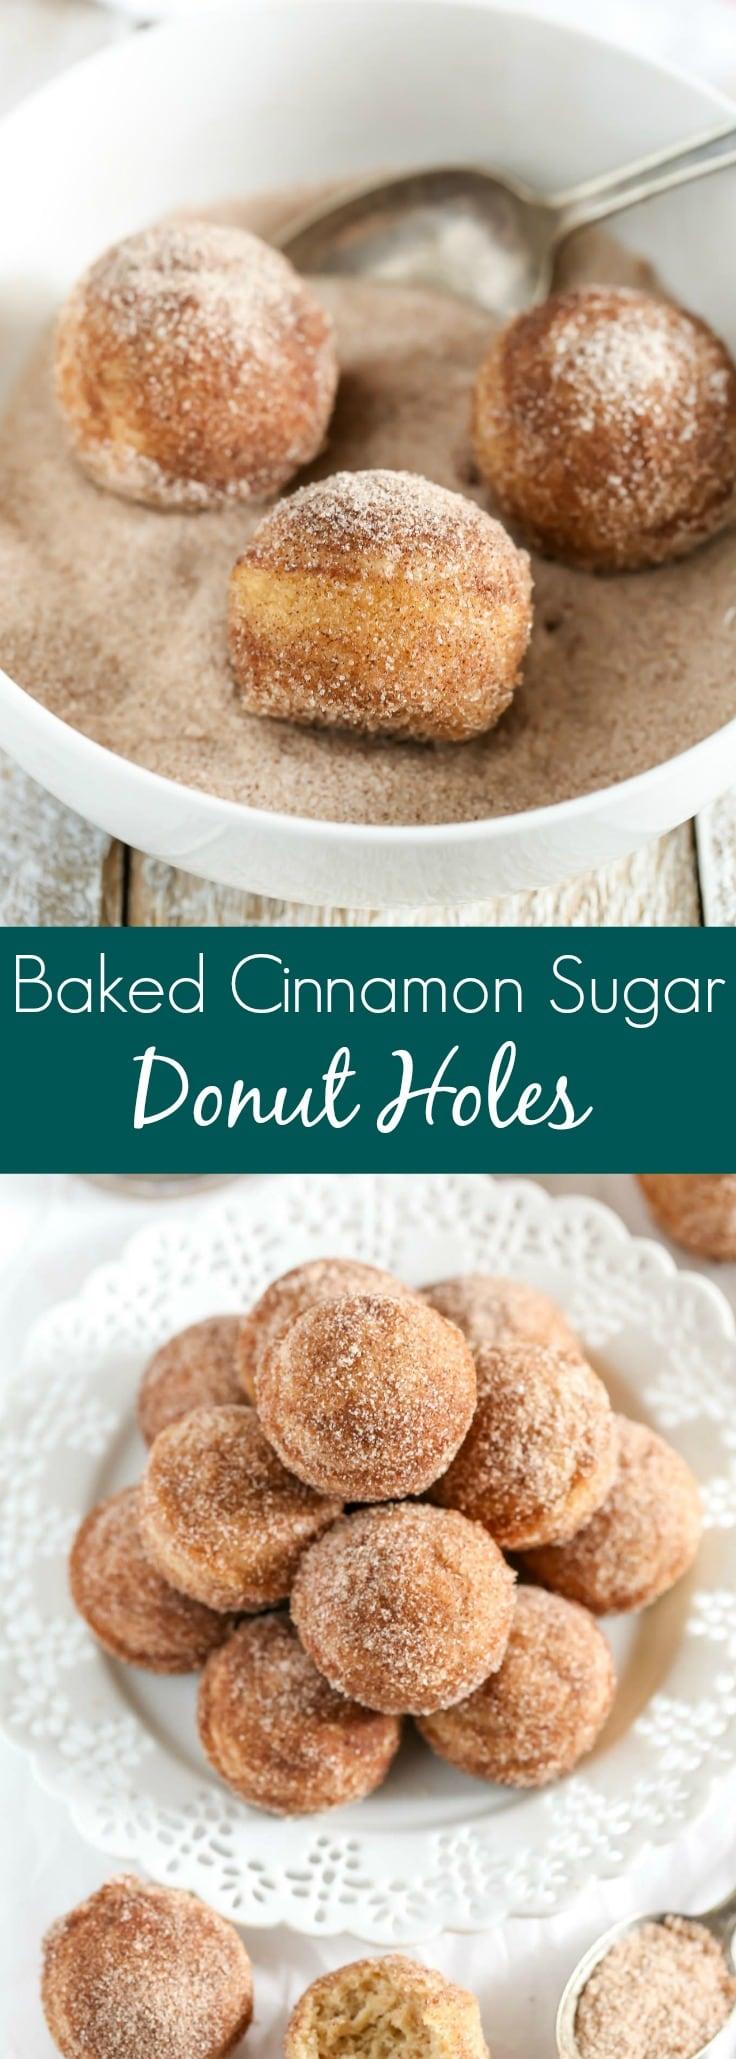 Baked Cinnamon Sugar Donut Holes Pinterest Collage